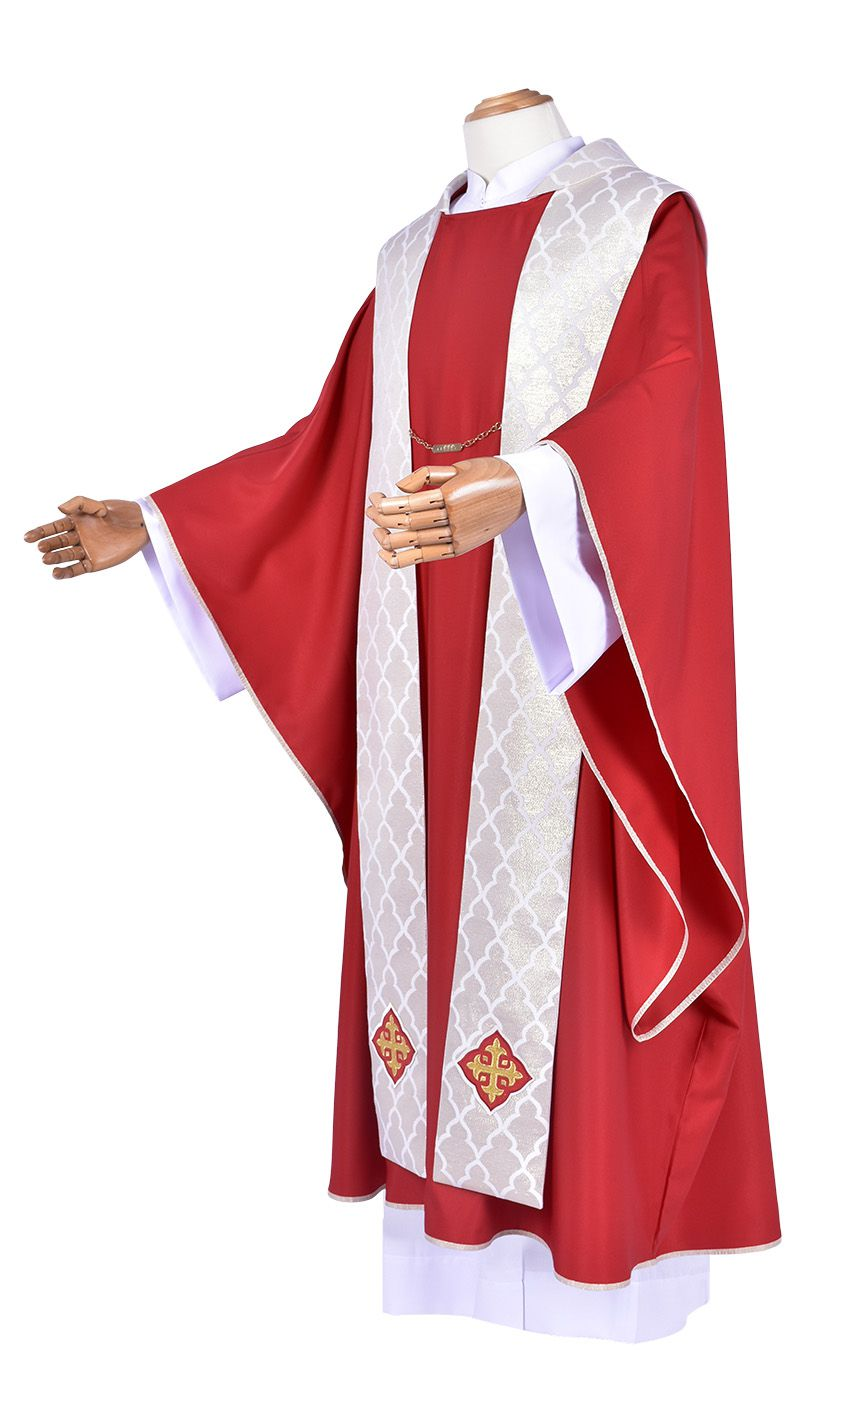 Prophets Chasuble CS093